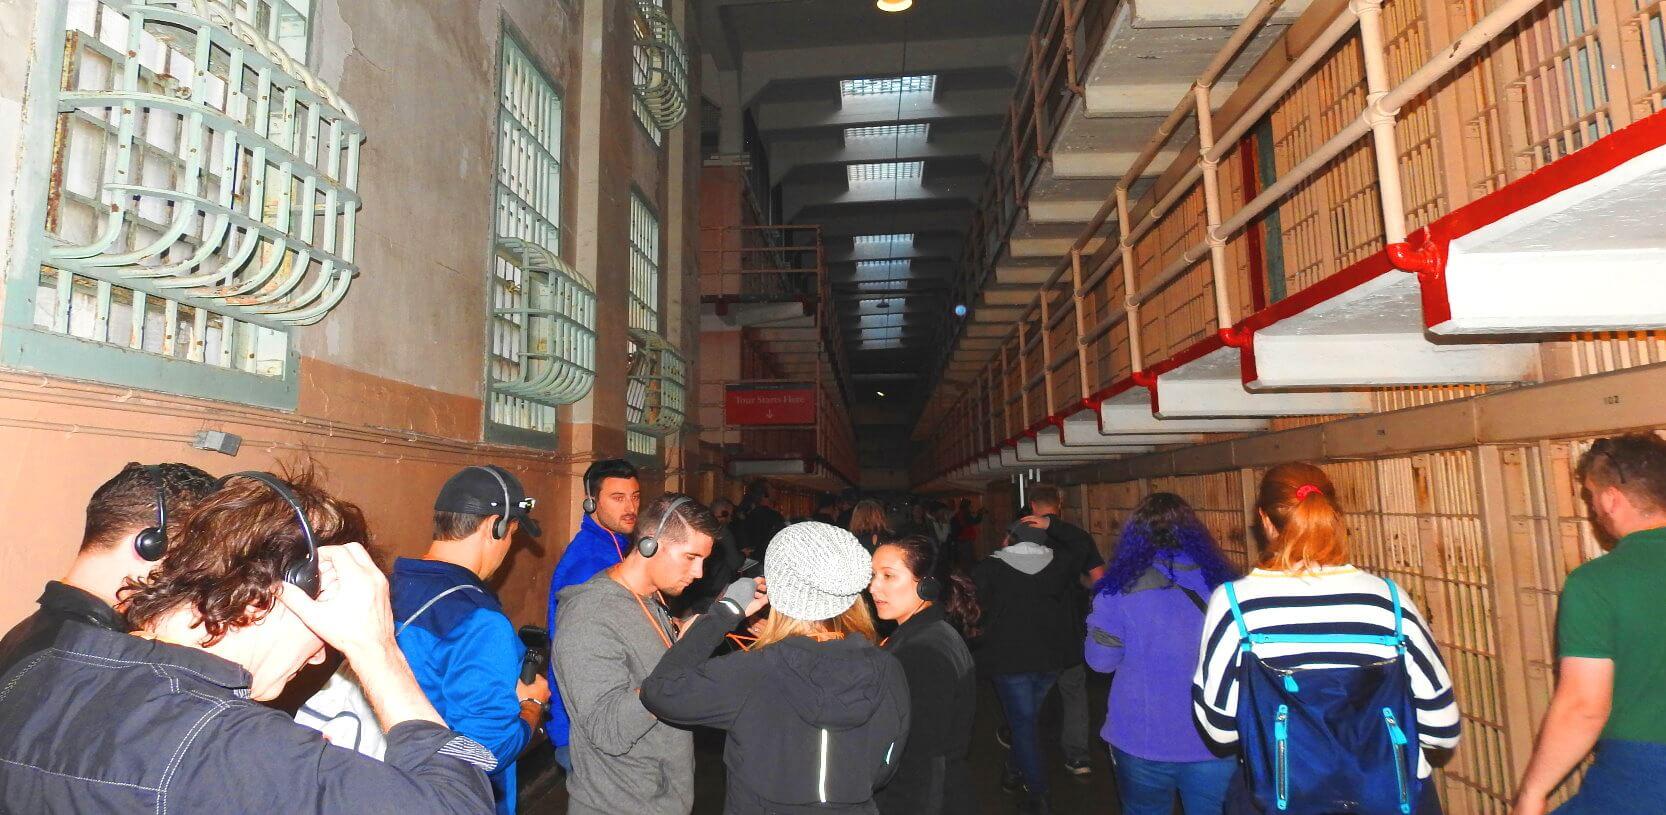 Alcatraz-Prison-Night-Tour-Jail-cells